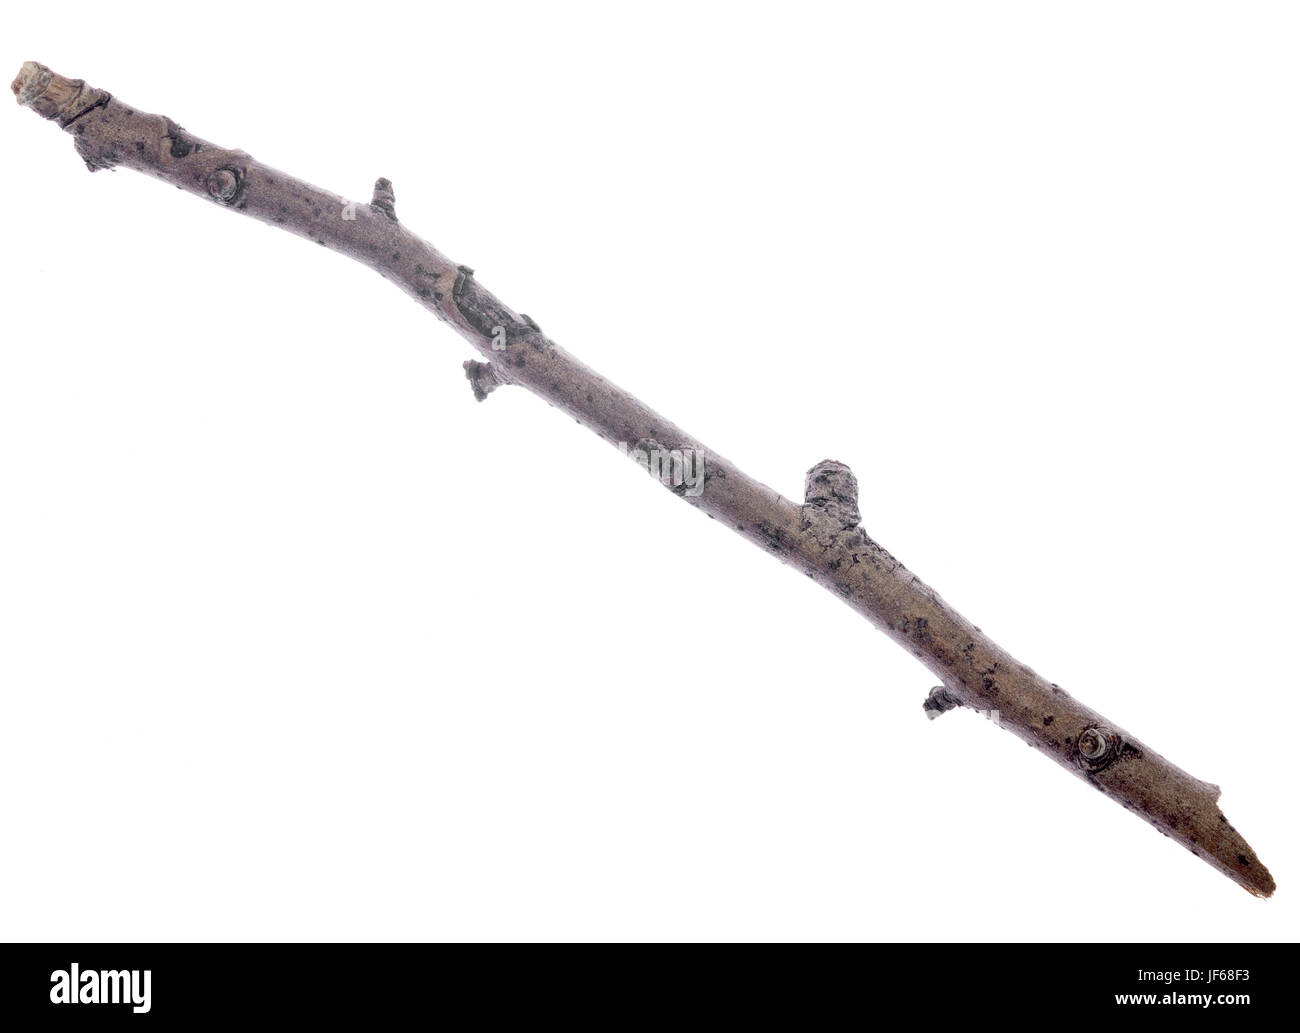 dry twig - Stock Image